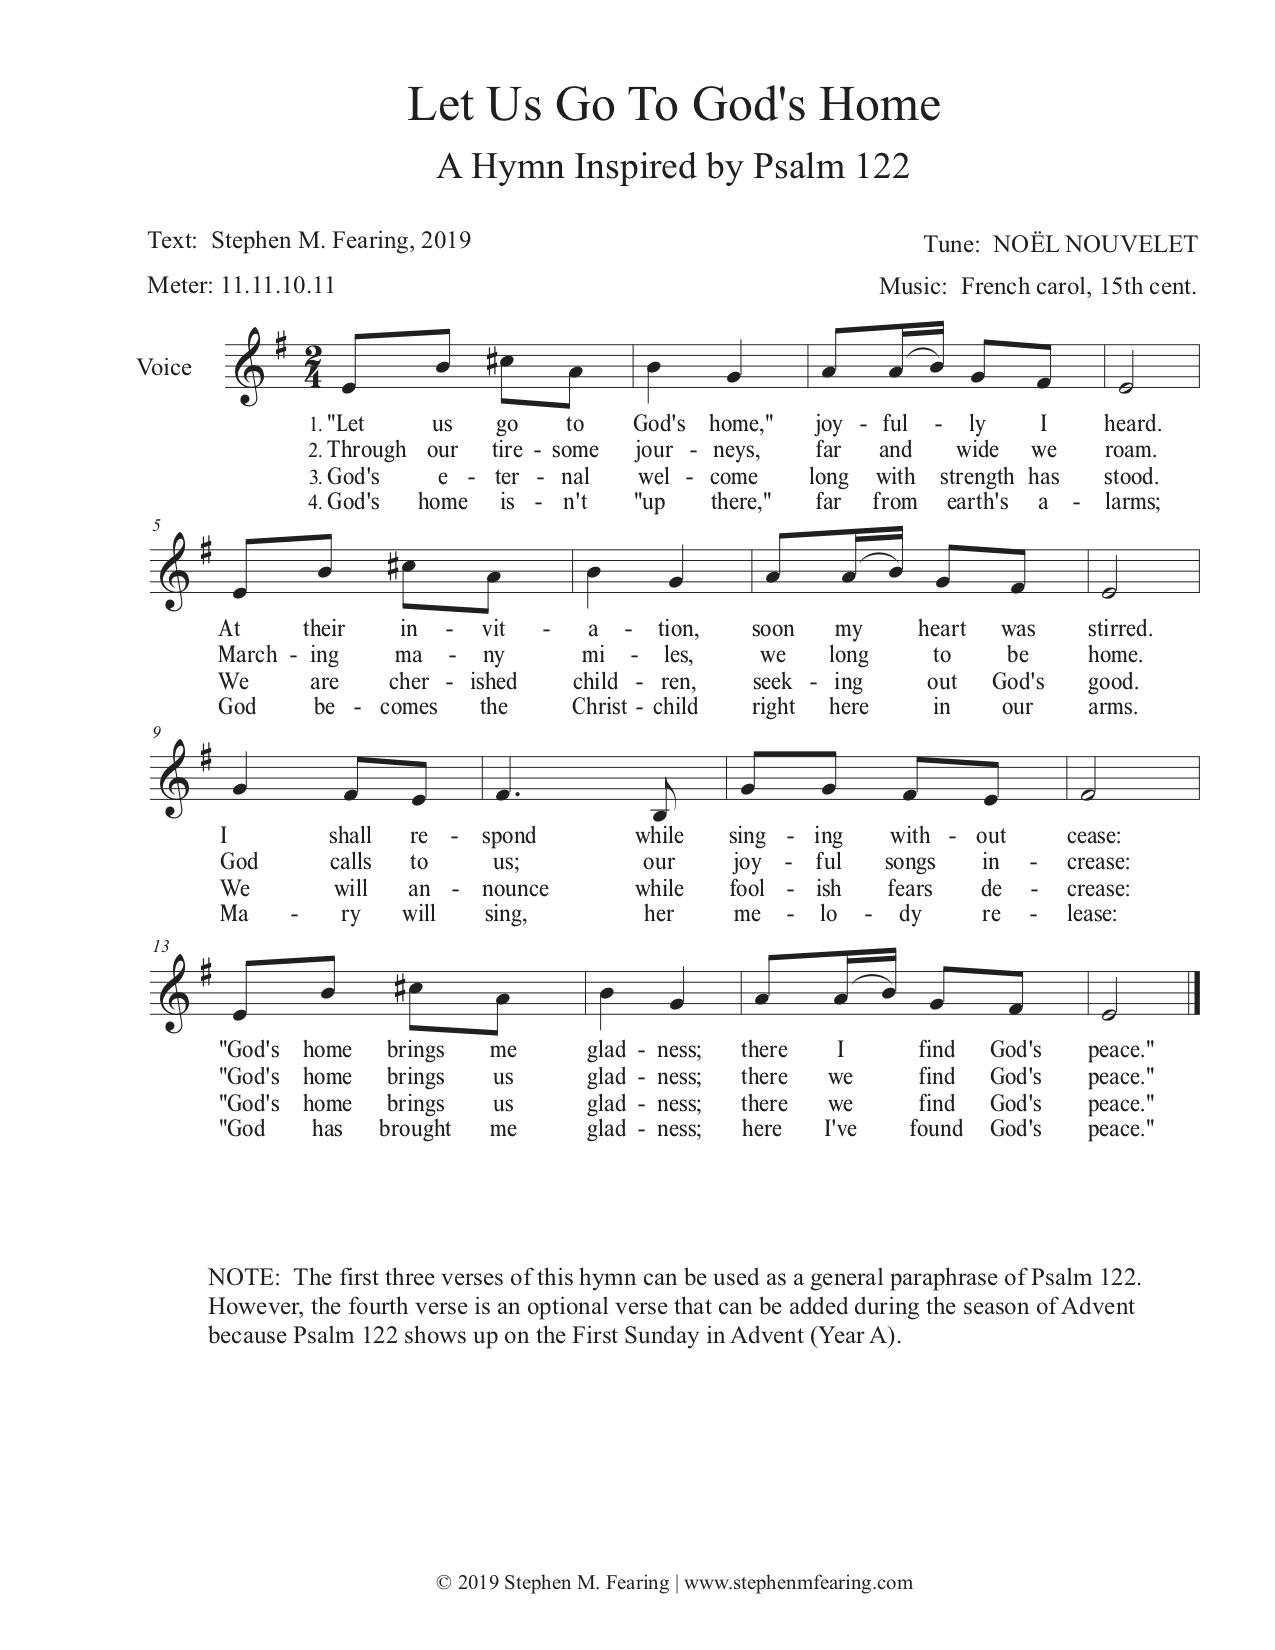 Let Us Go To God's Home - Score.jpg